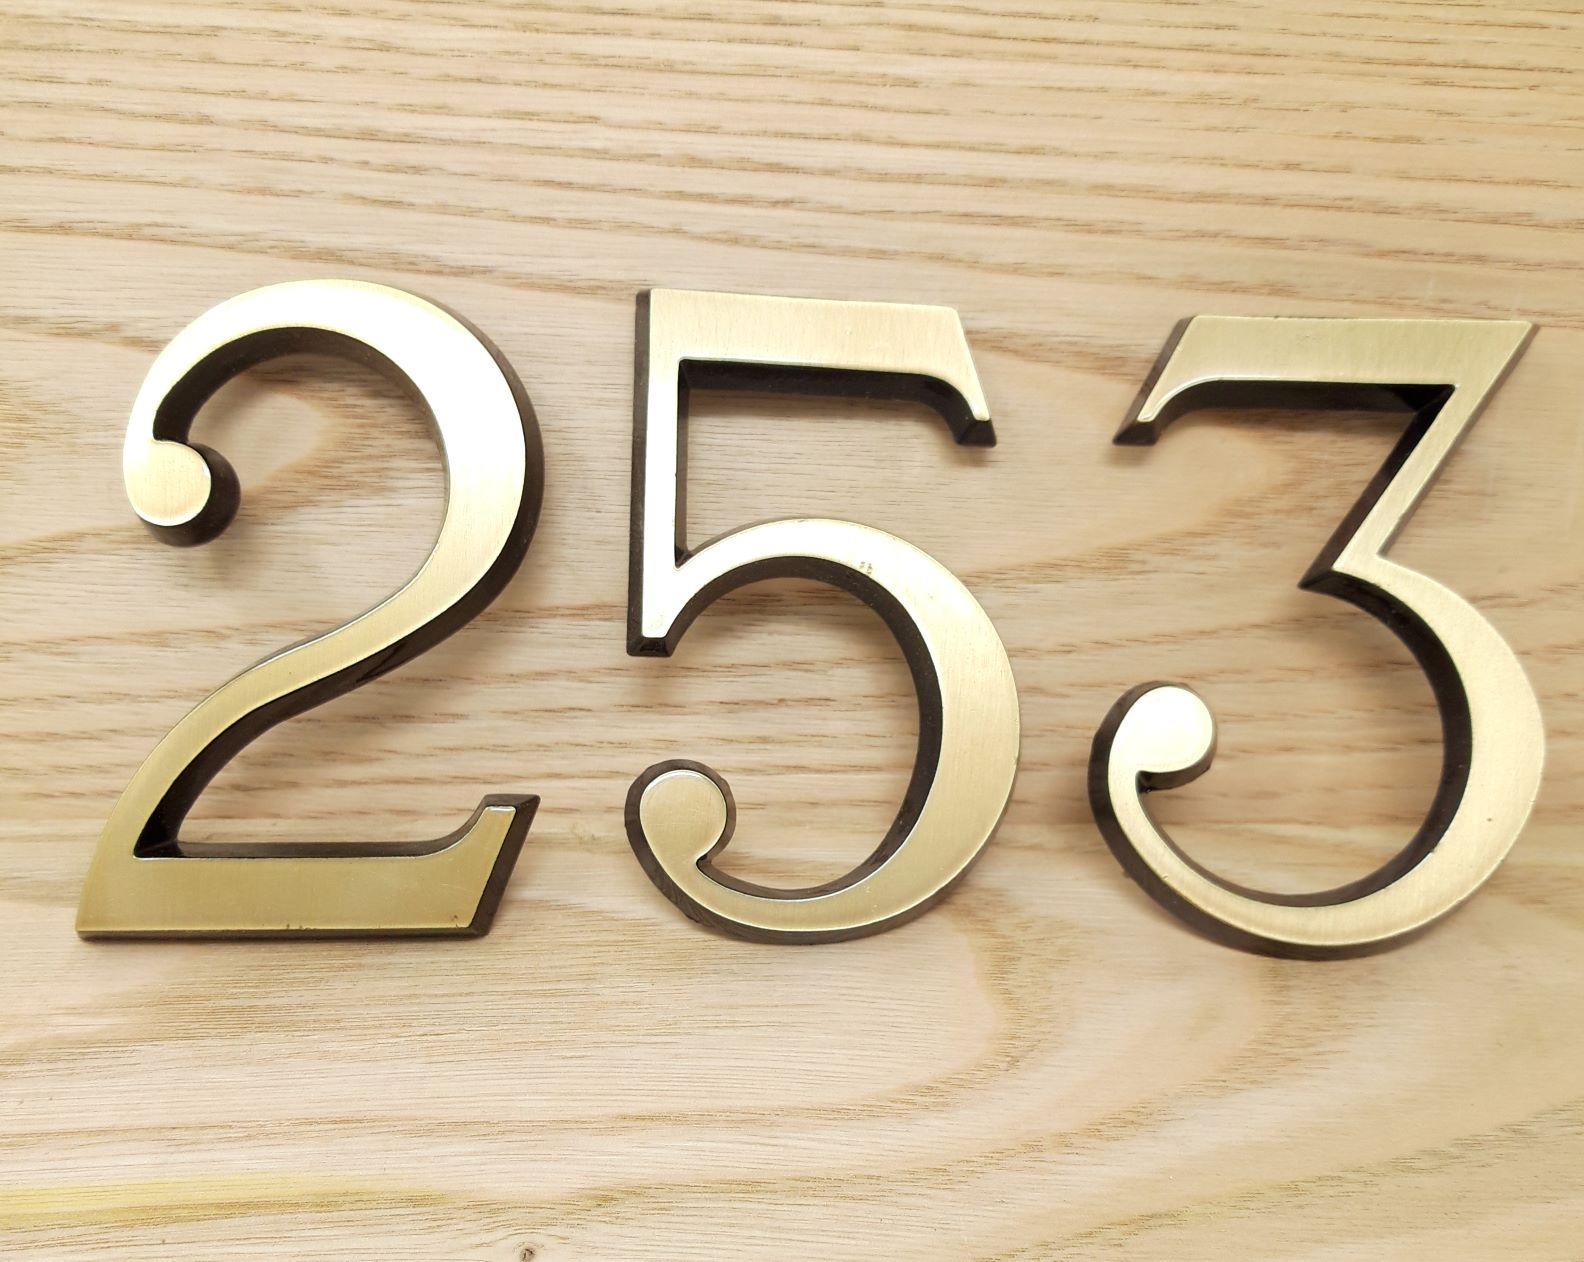 Números latón 8 cm 1.jpg